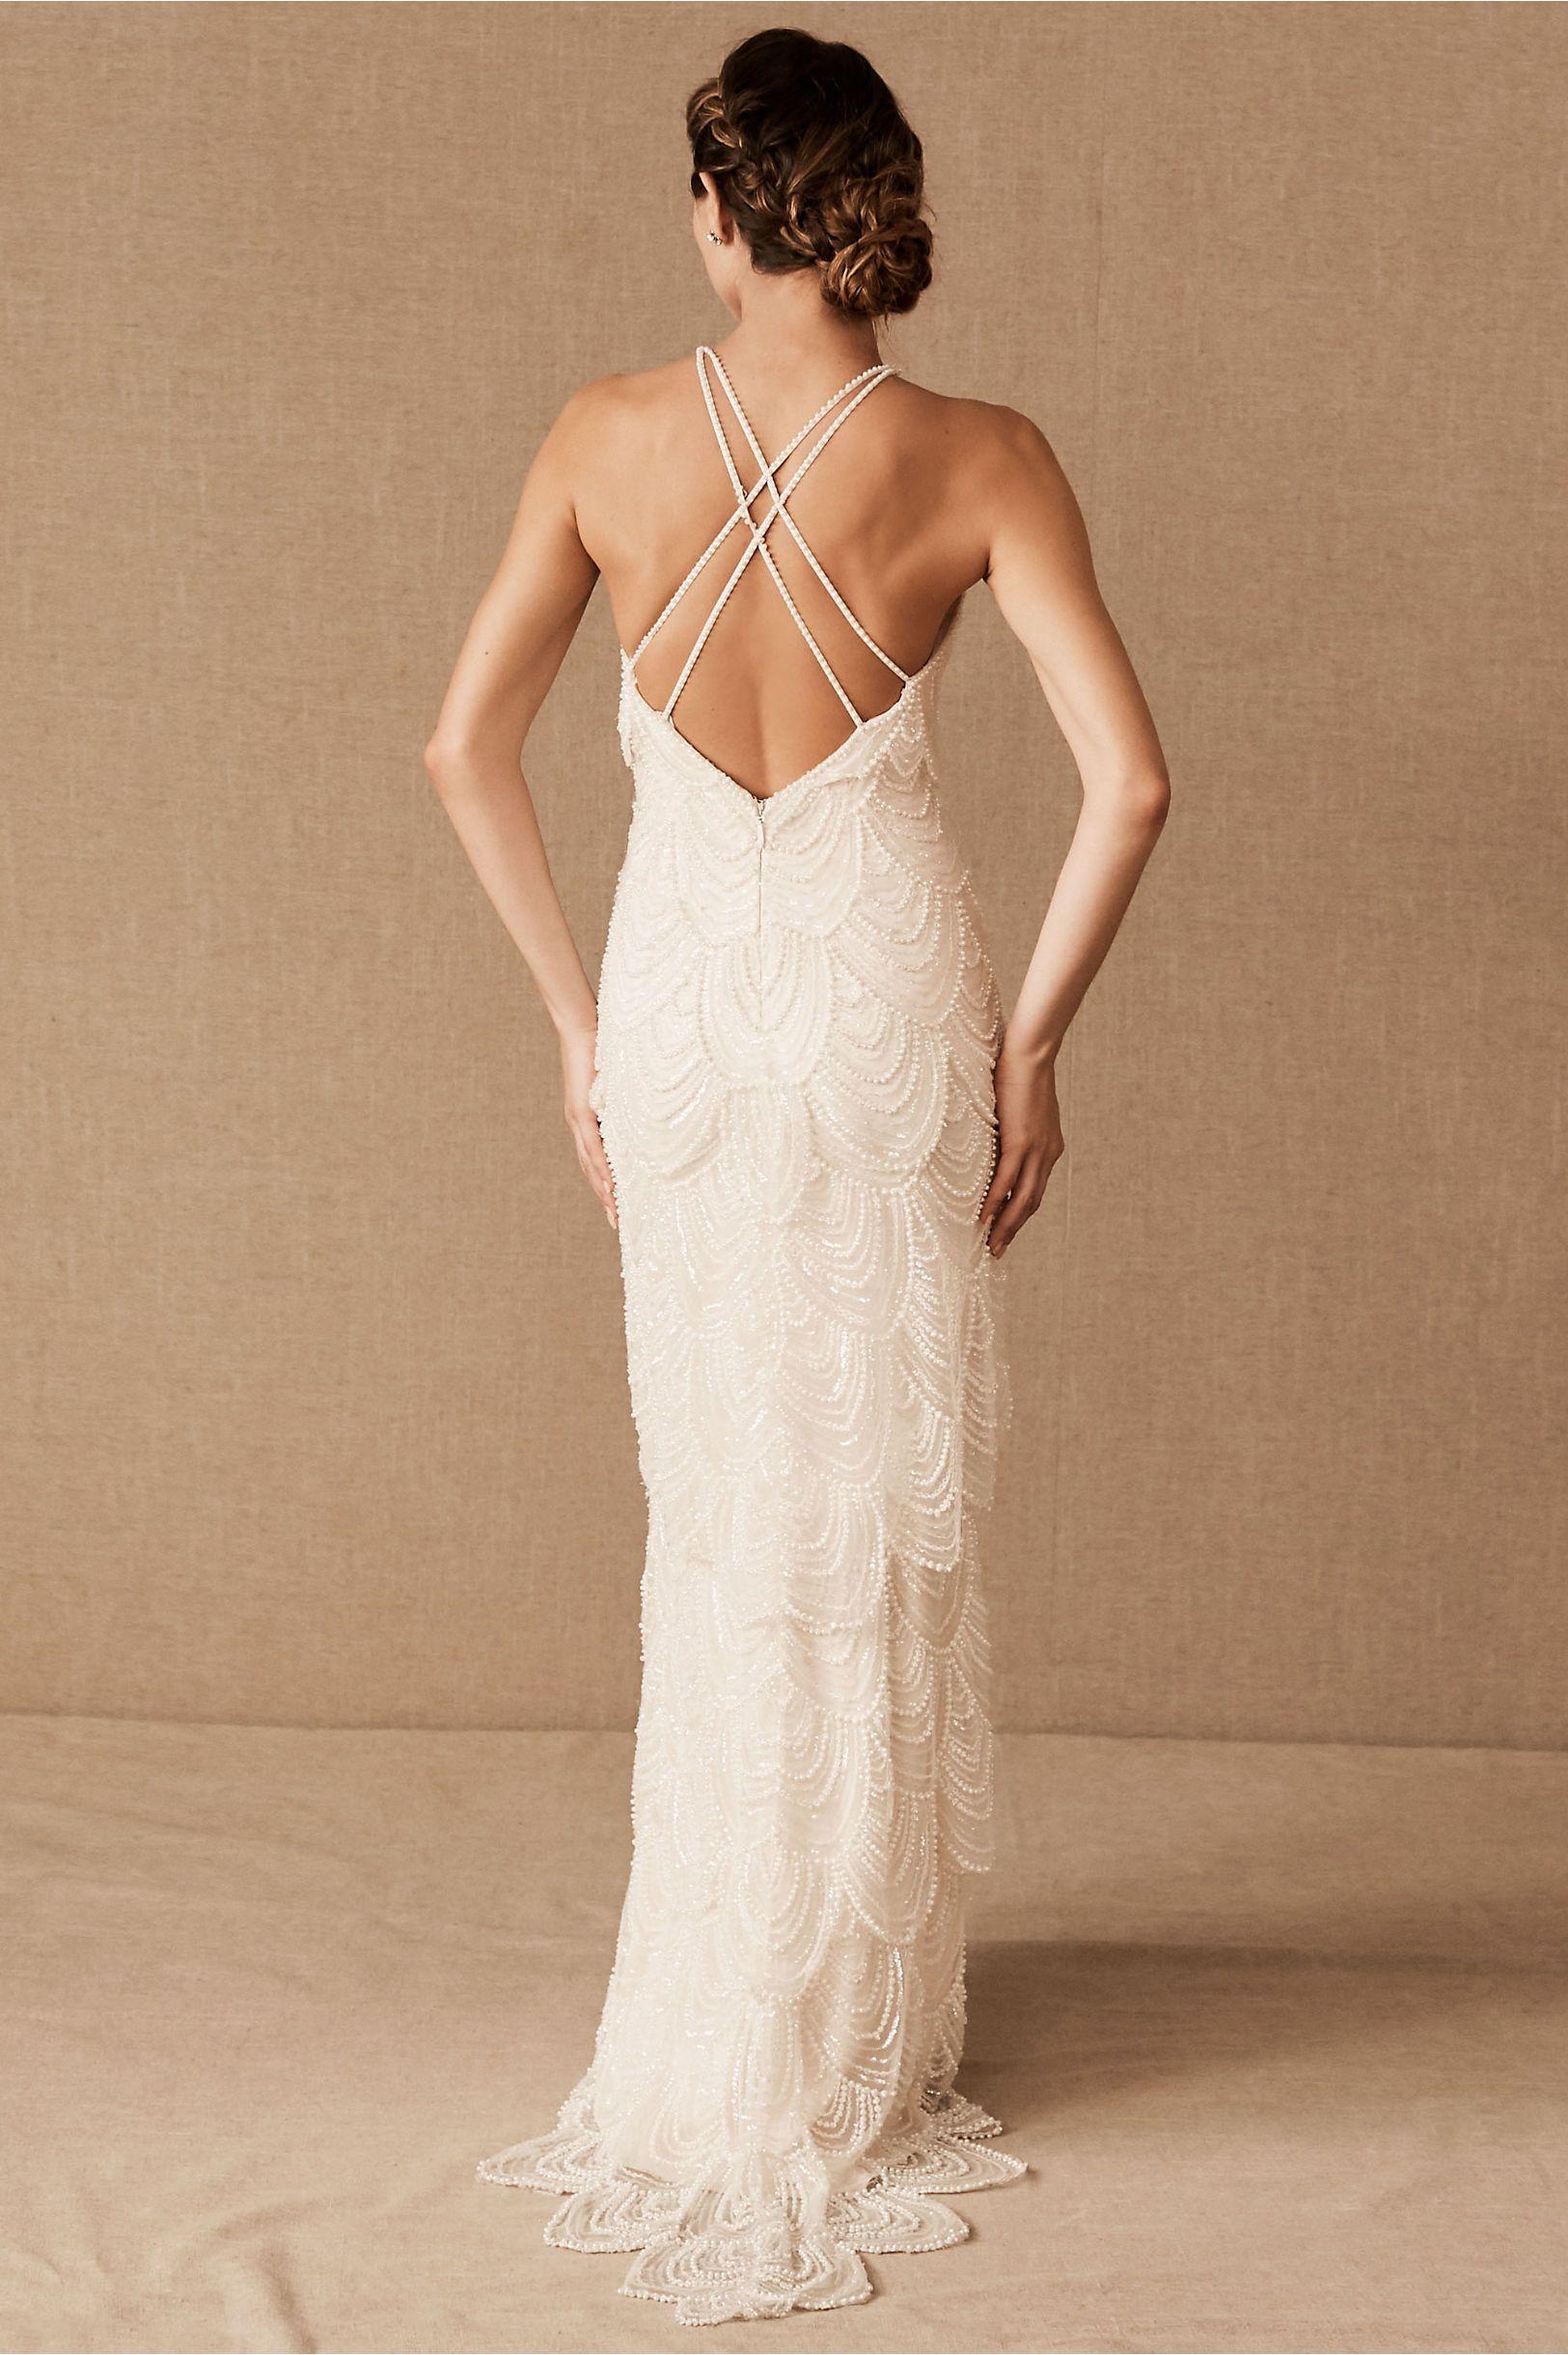 Catherine Deane Niki Gown Wedding Dresses Sheath Wedding Dress Gowns Dresses